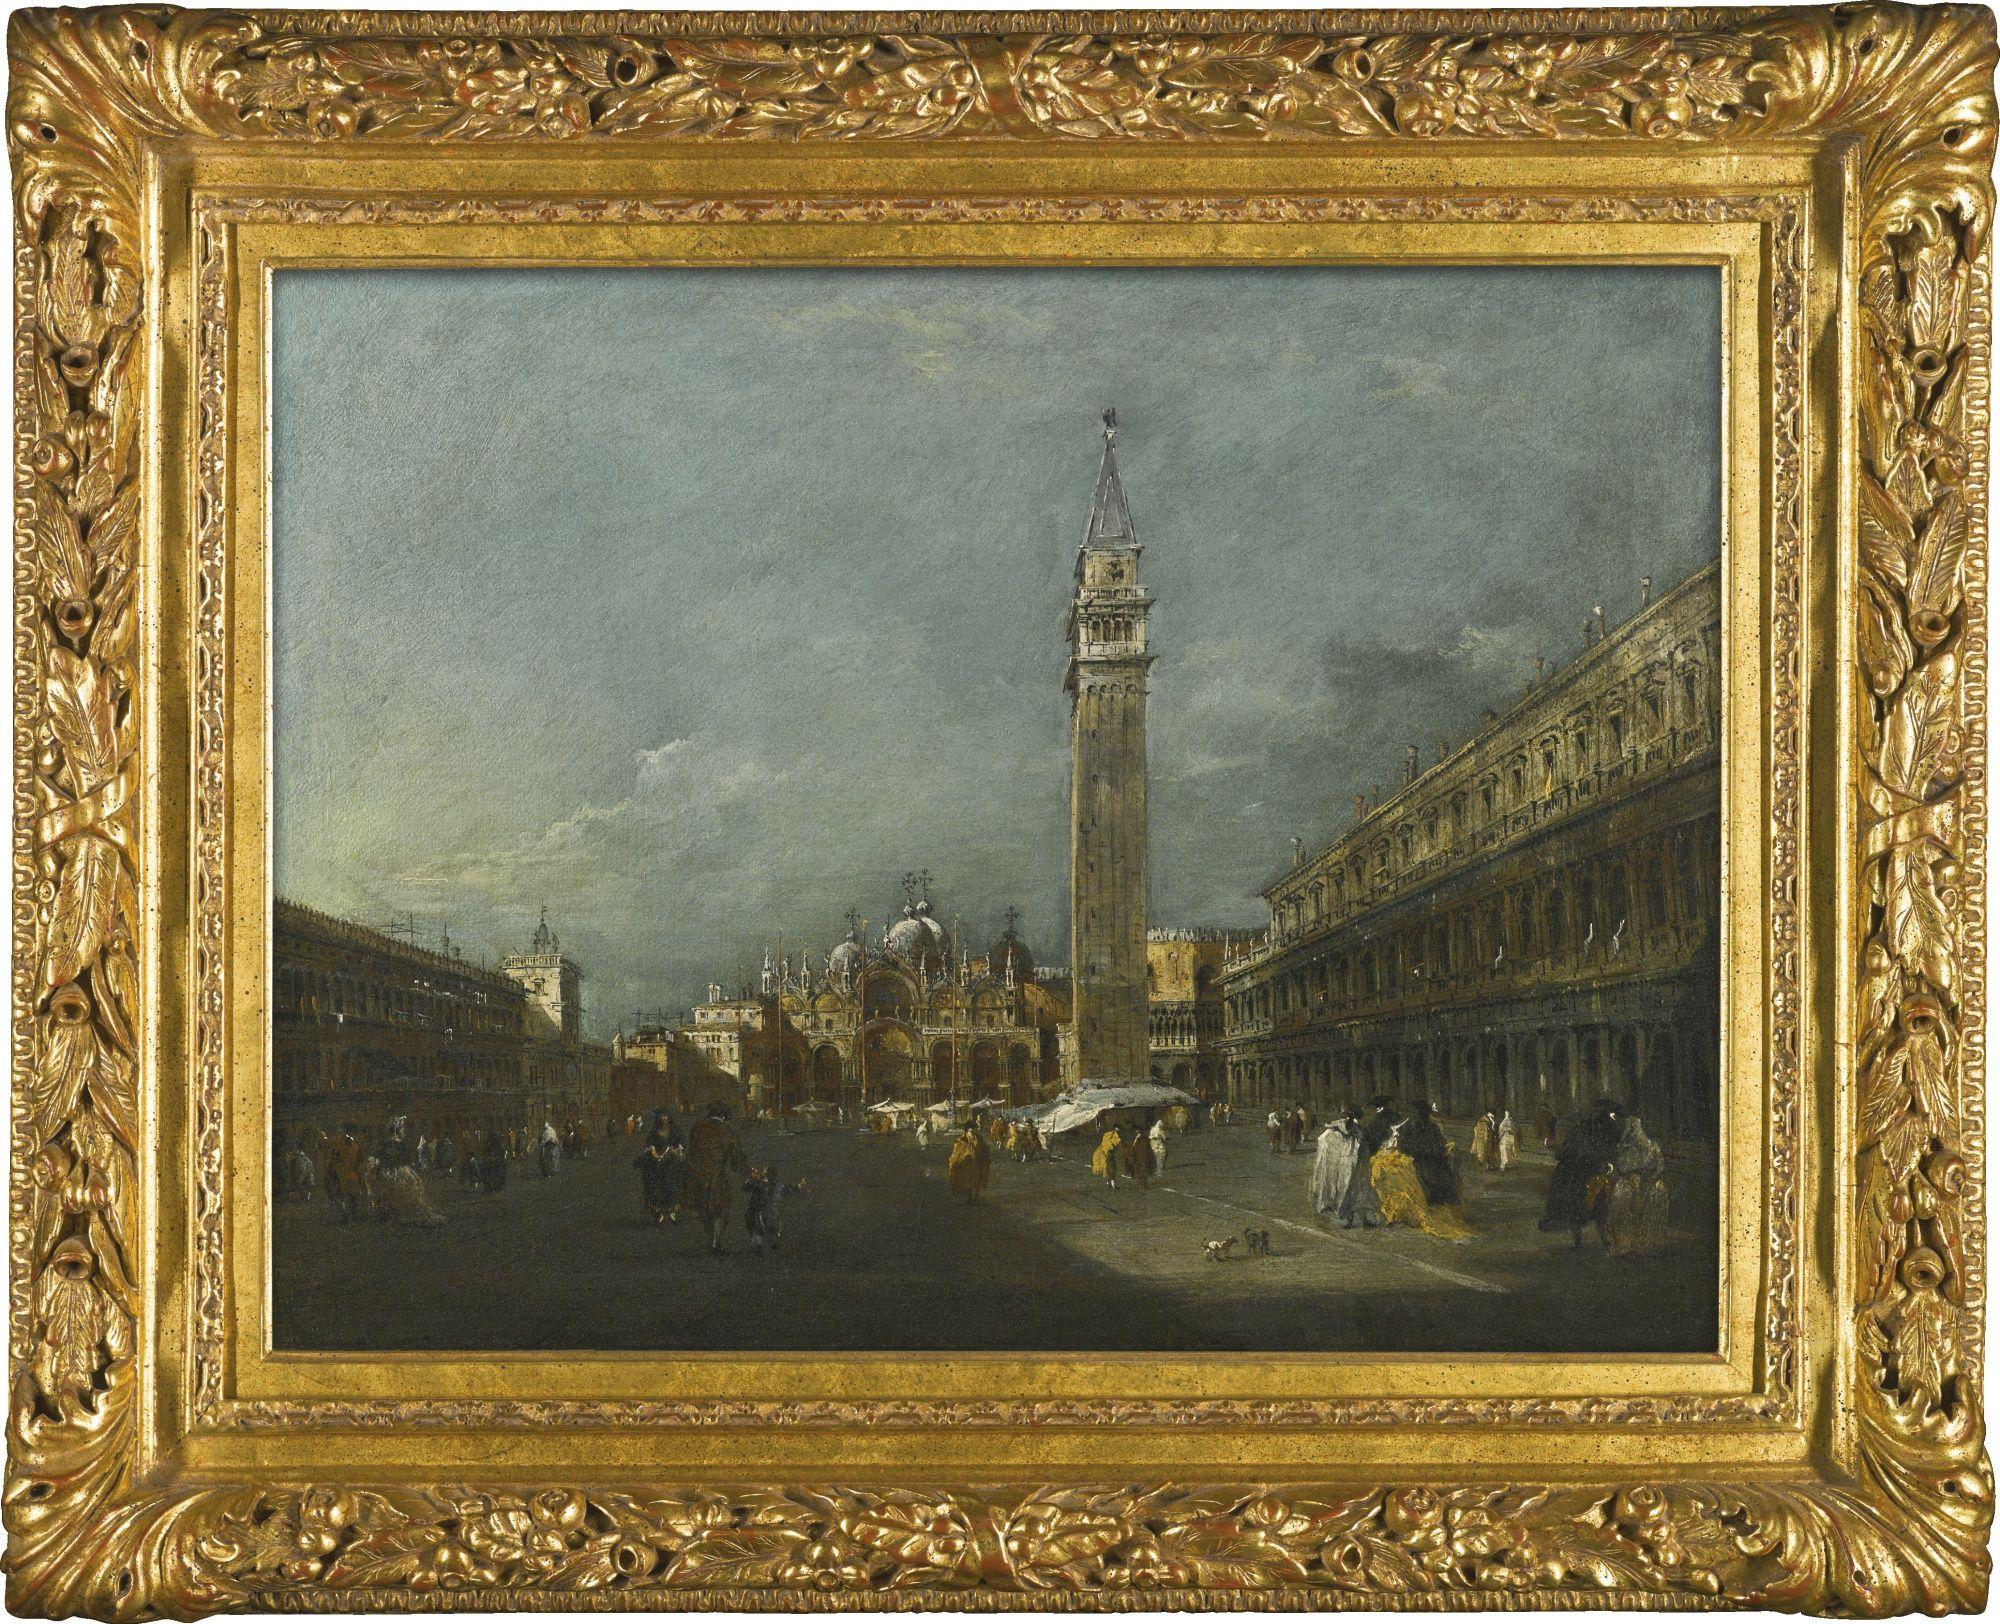 Francesco Guardi VENICE 1712   1793 VENICE, PIAZZA SAN MARCO, LOOKING EAST  TOWARDS THE